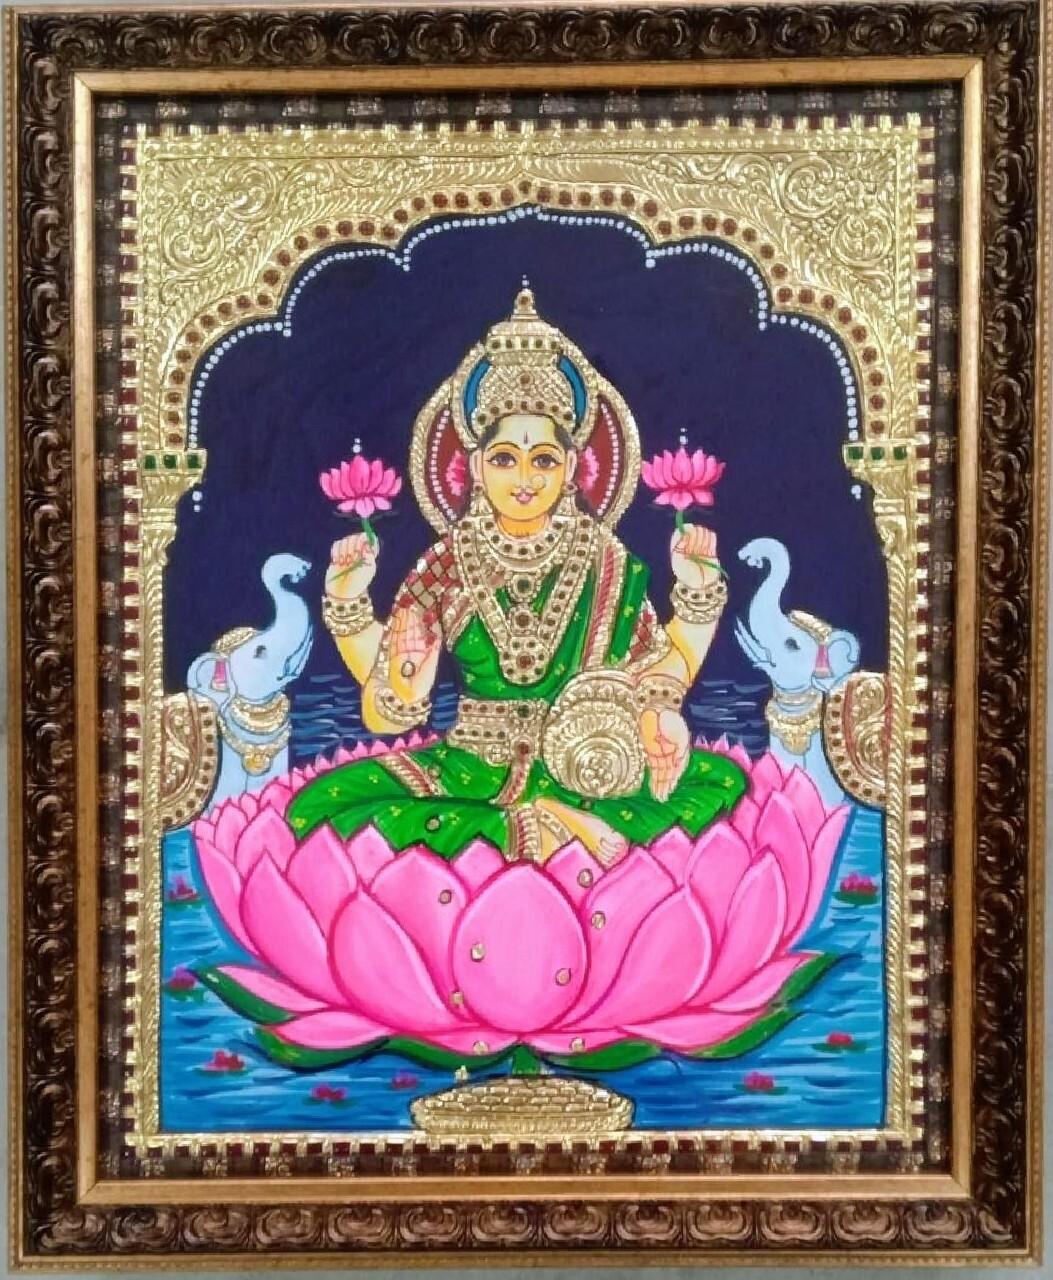 Goddess Lakshmi Devi - Tanjore Art work Gold Foil Frame